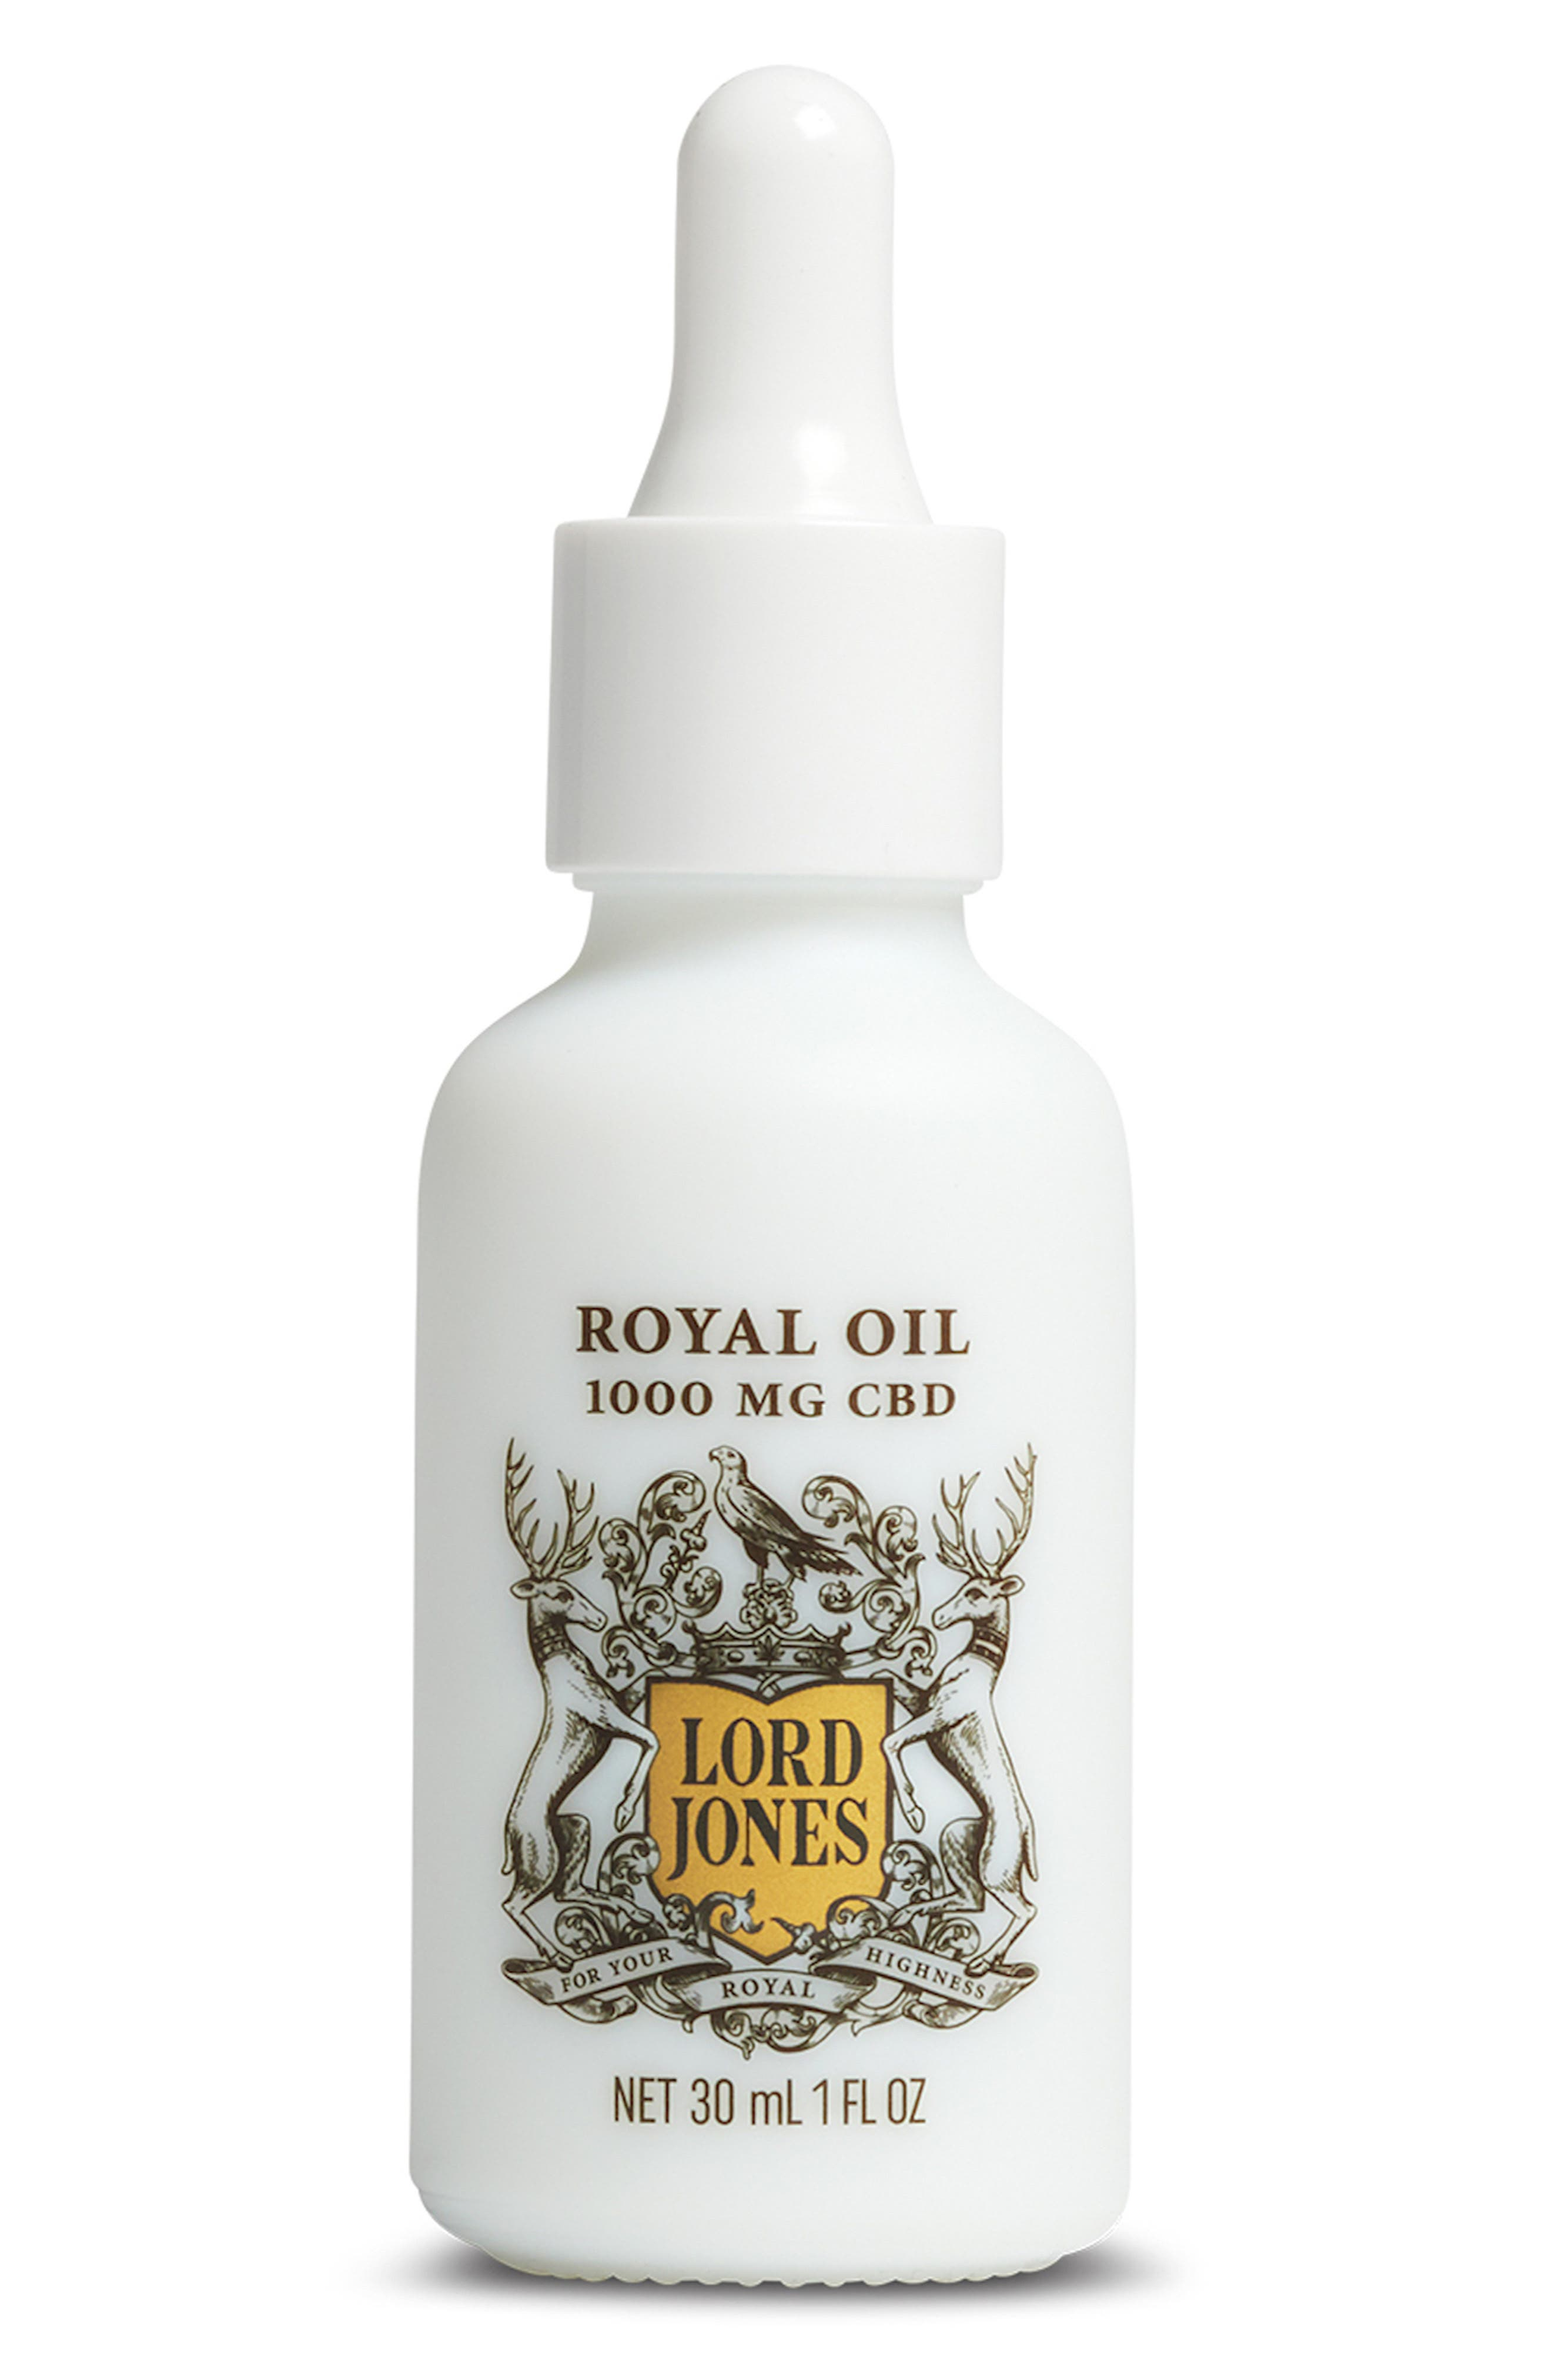 Royal Oil 1000Mg Cbd